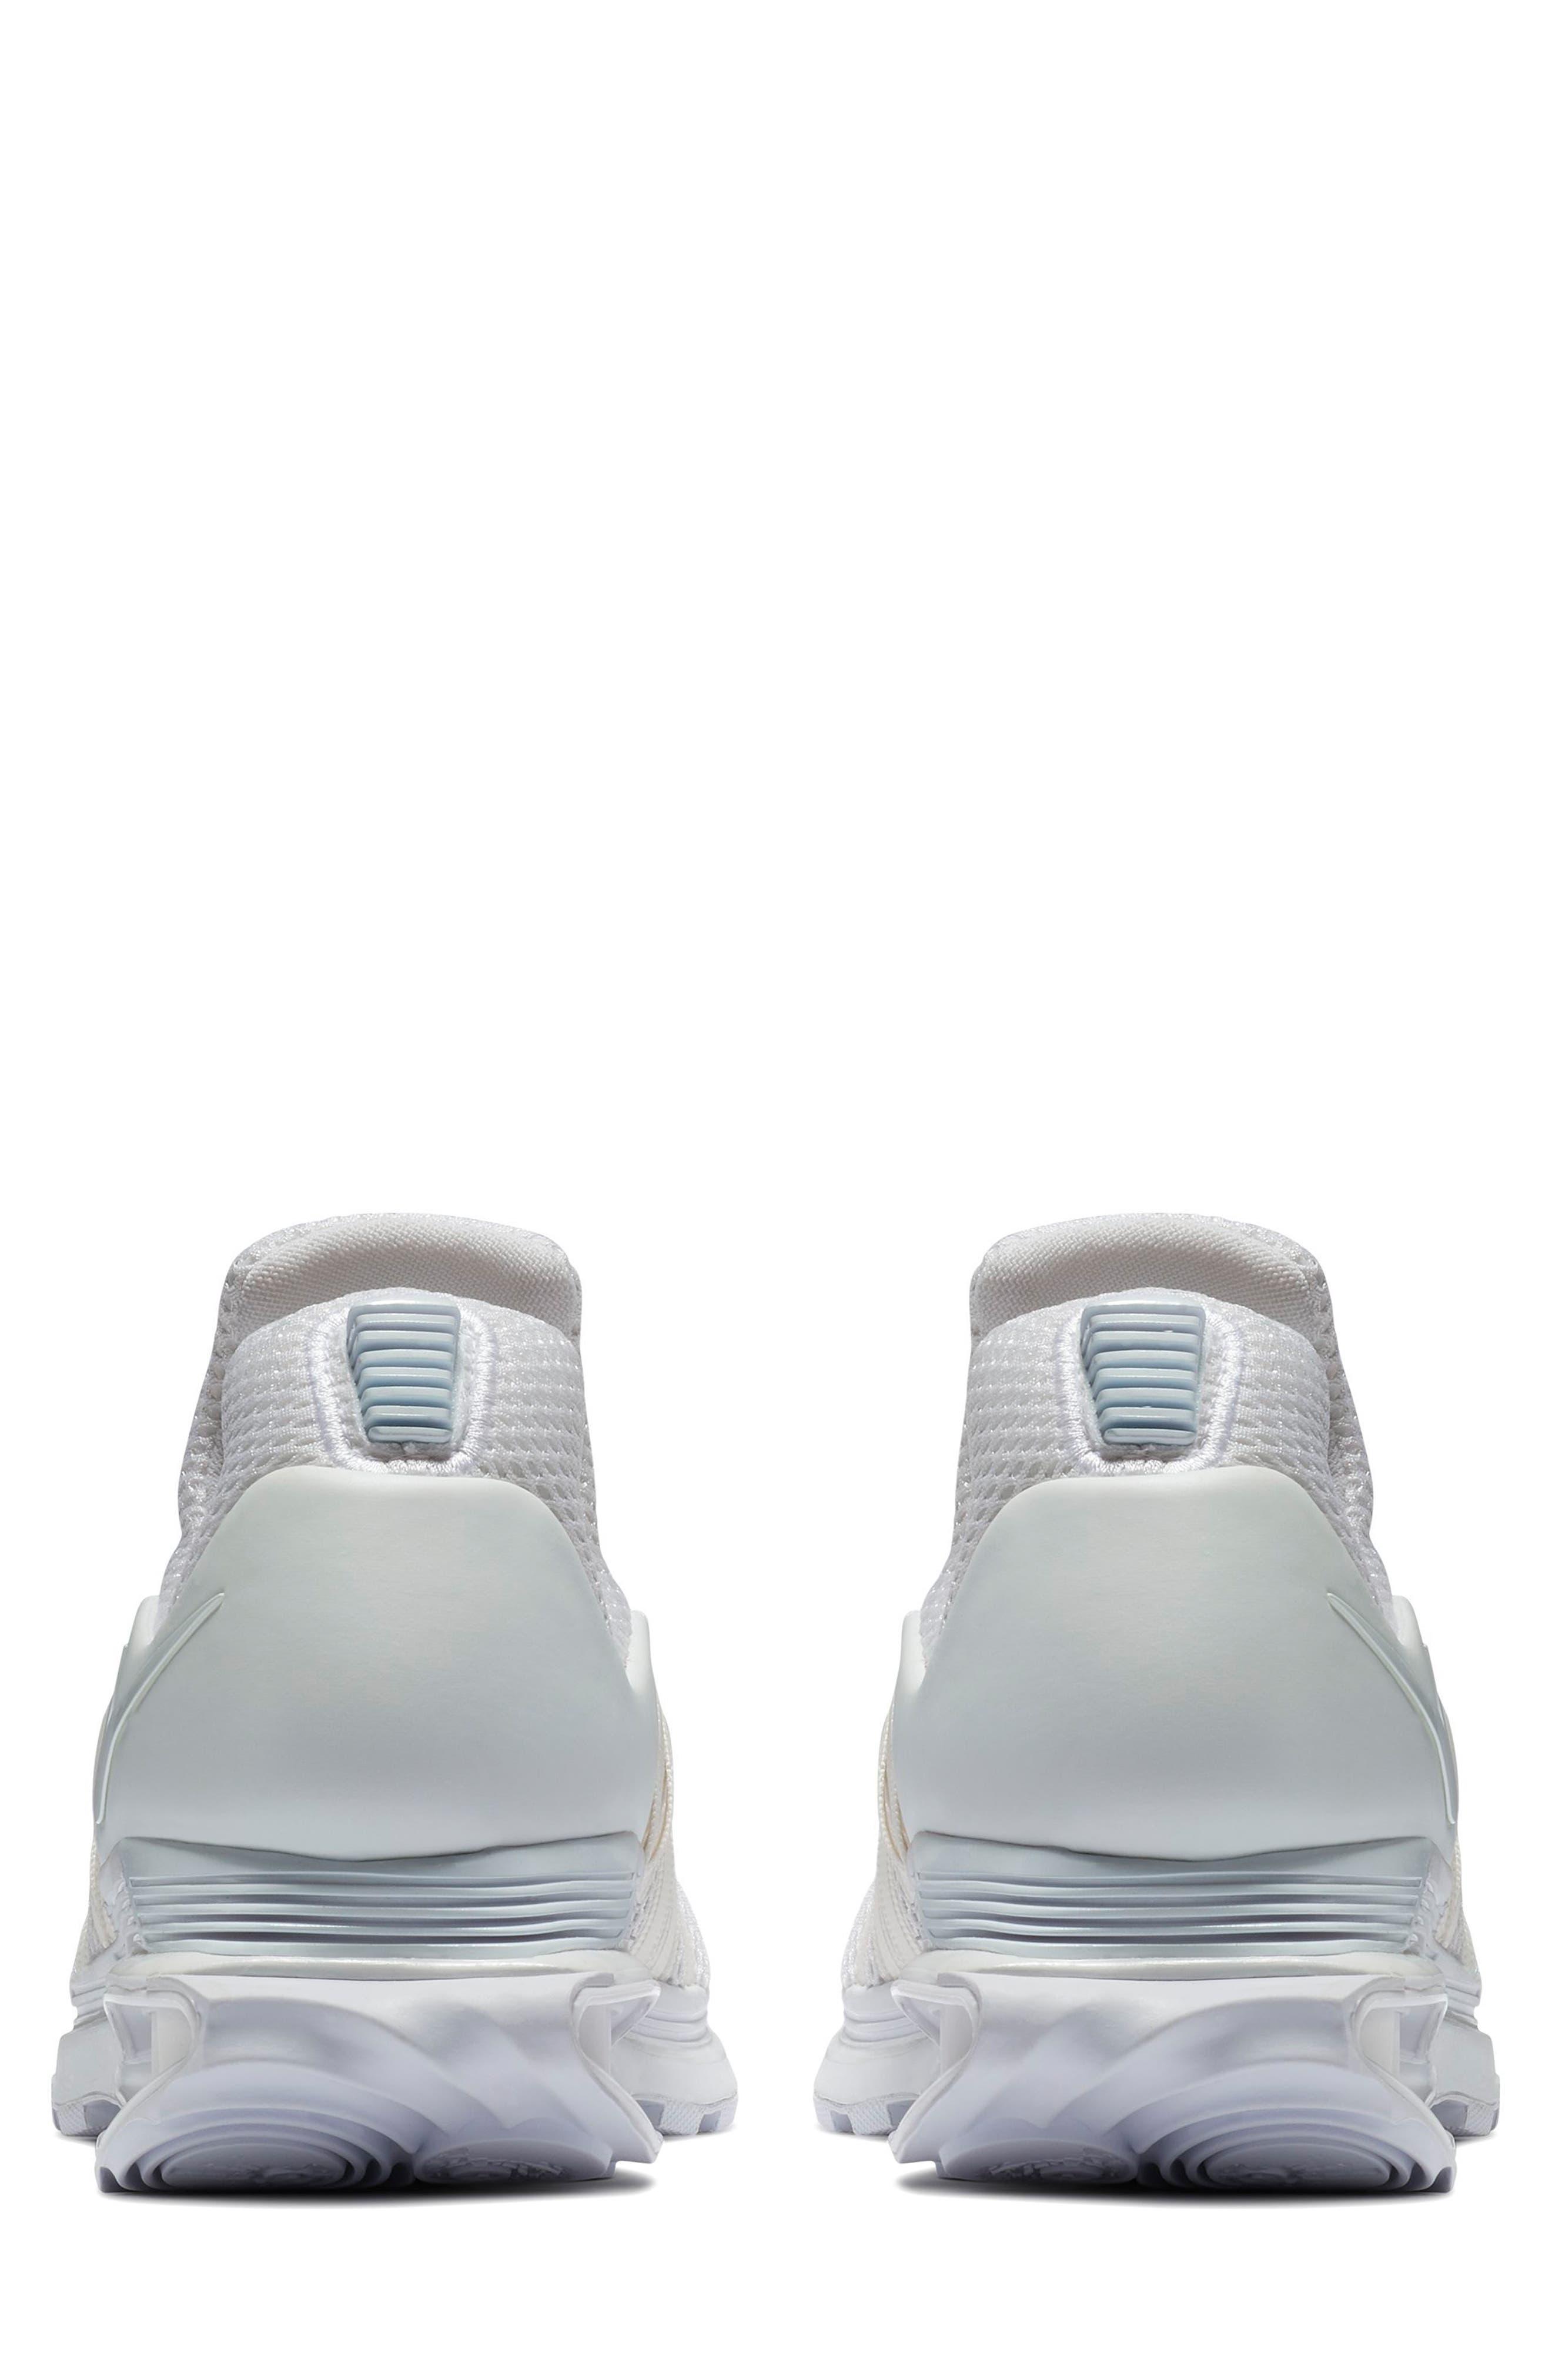 NIKE, Shox Gravity Sneaker, Alternate thumbnail 2, color, 100